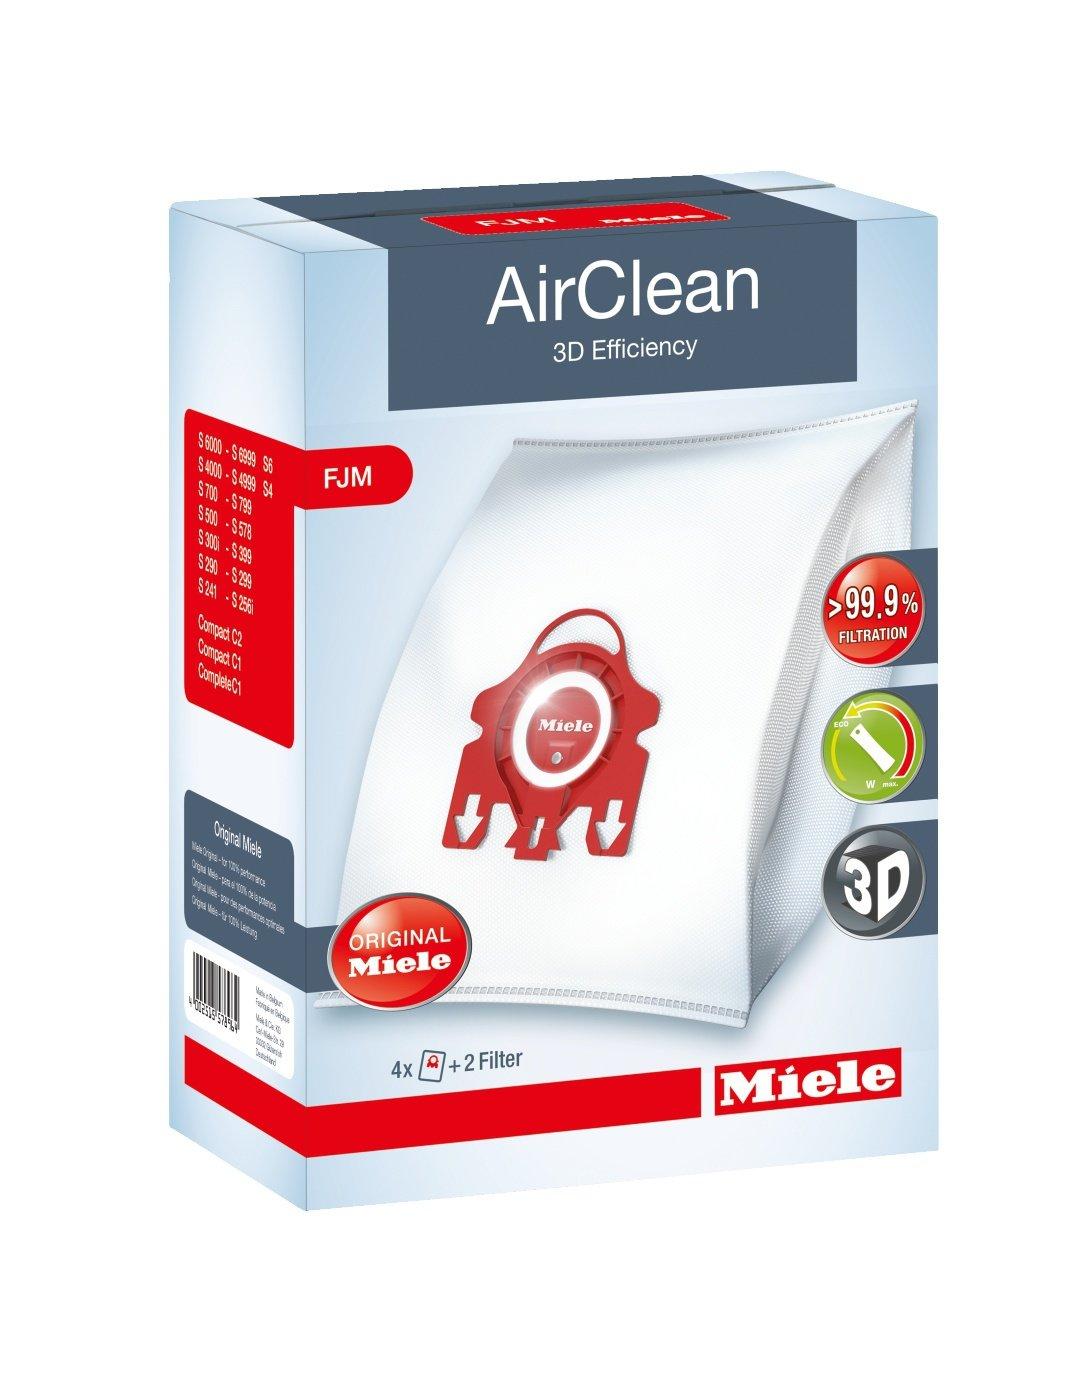 Miele AirClean 3D Efficiency Dust Bag, Type FJM, 12 Bags & 6 Filters